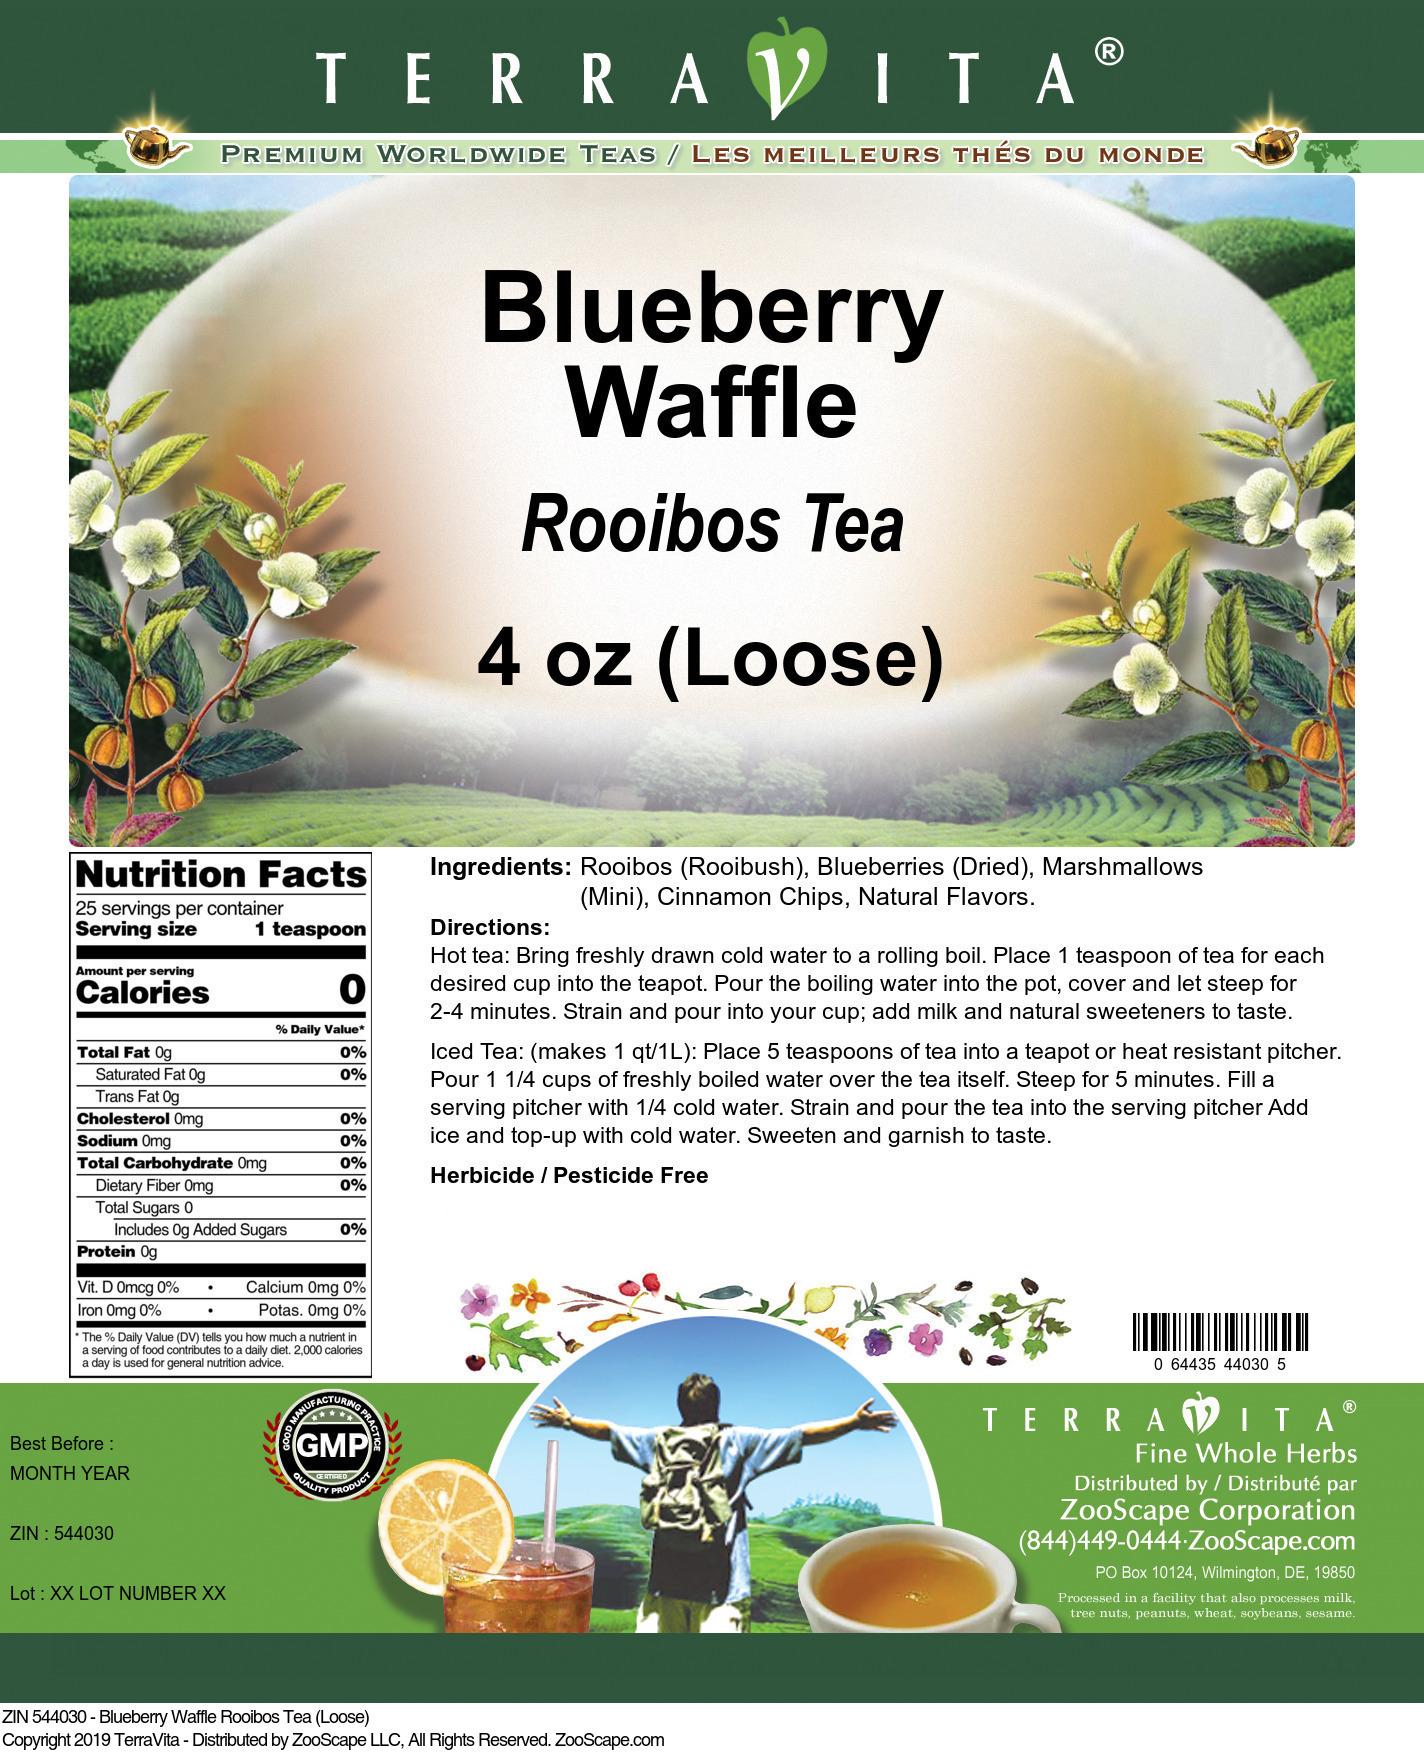 Blueberry Waffle Rooibos Tea (Loose)